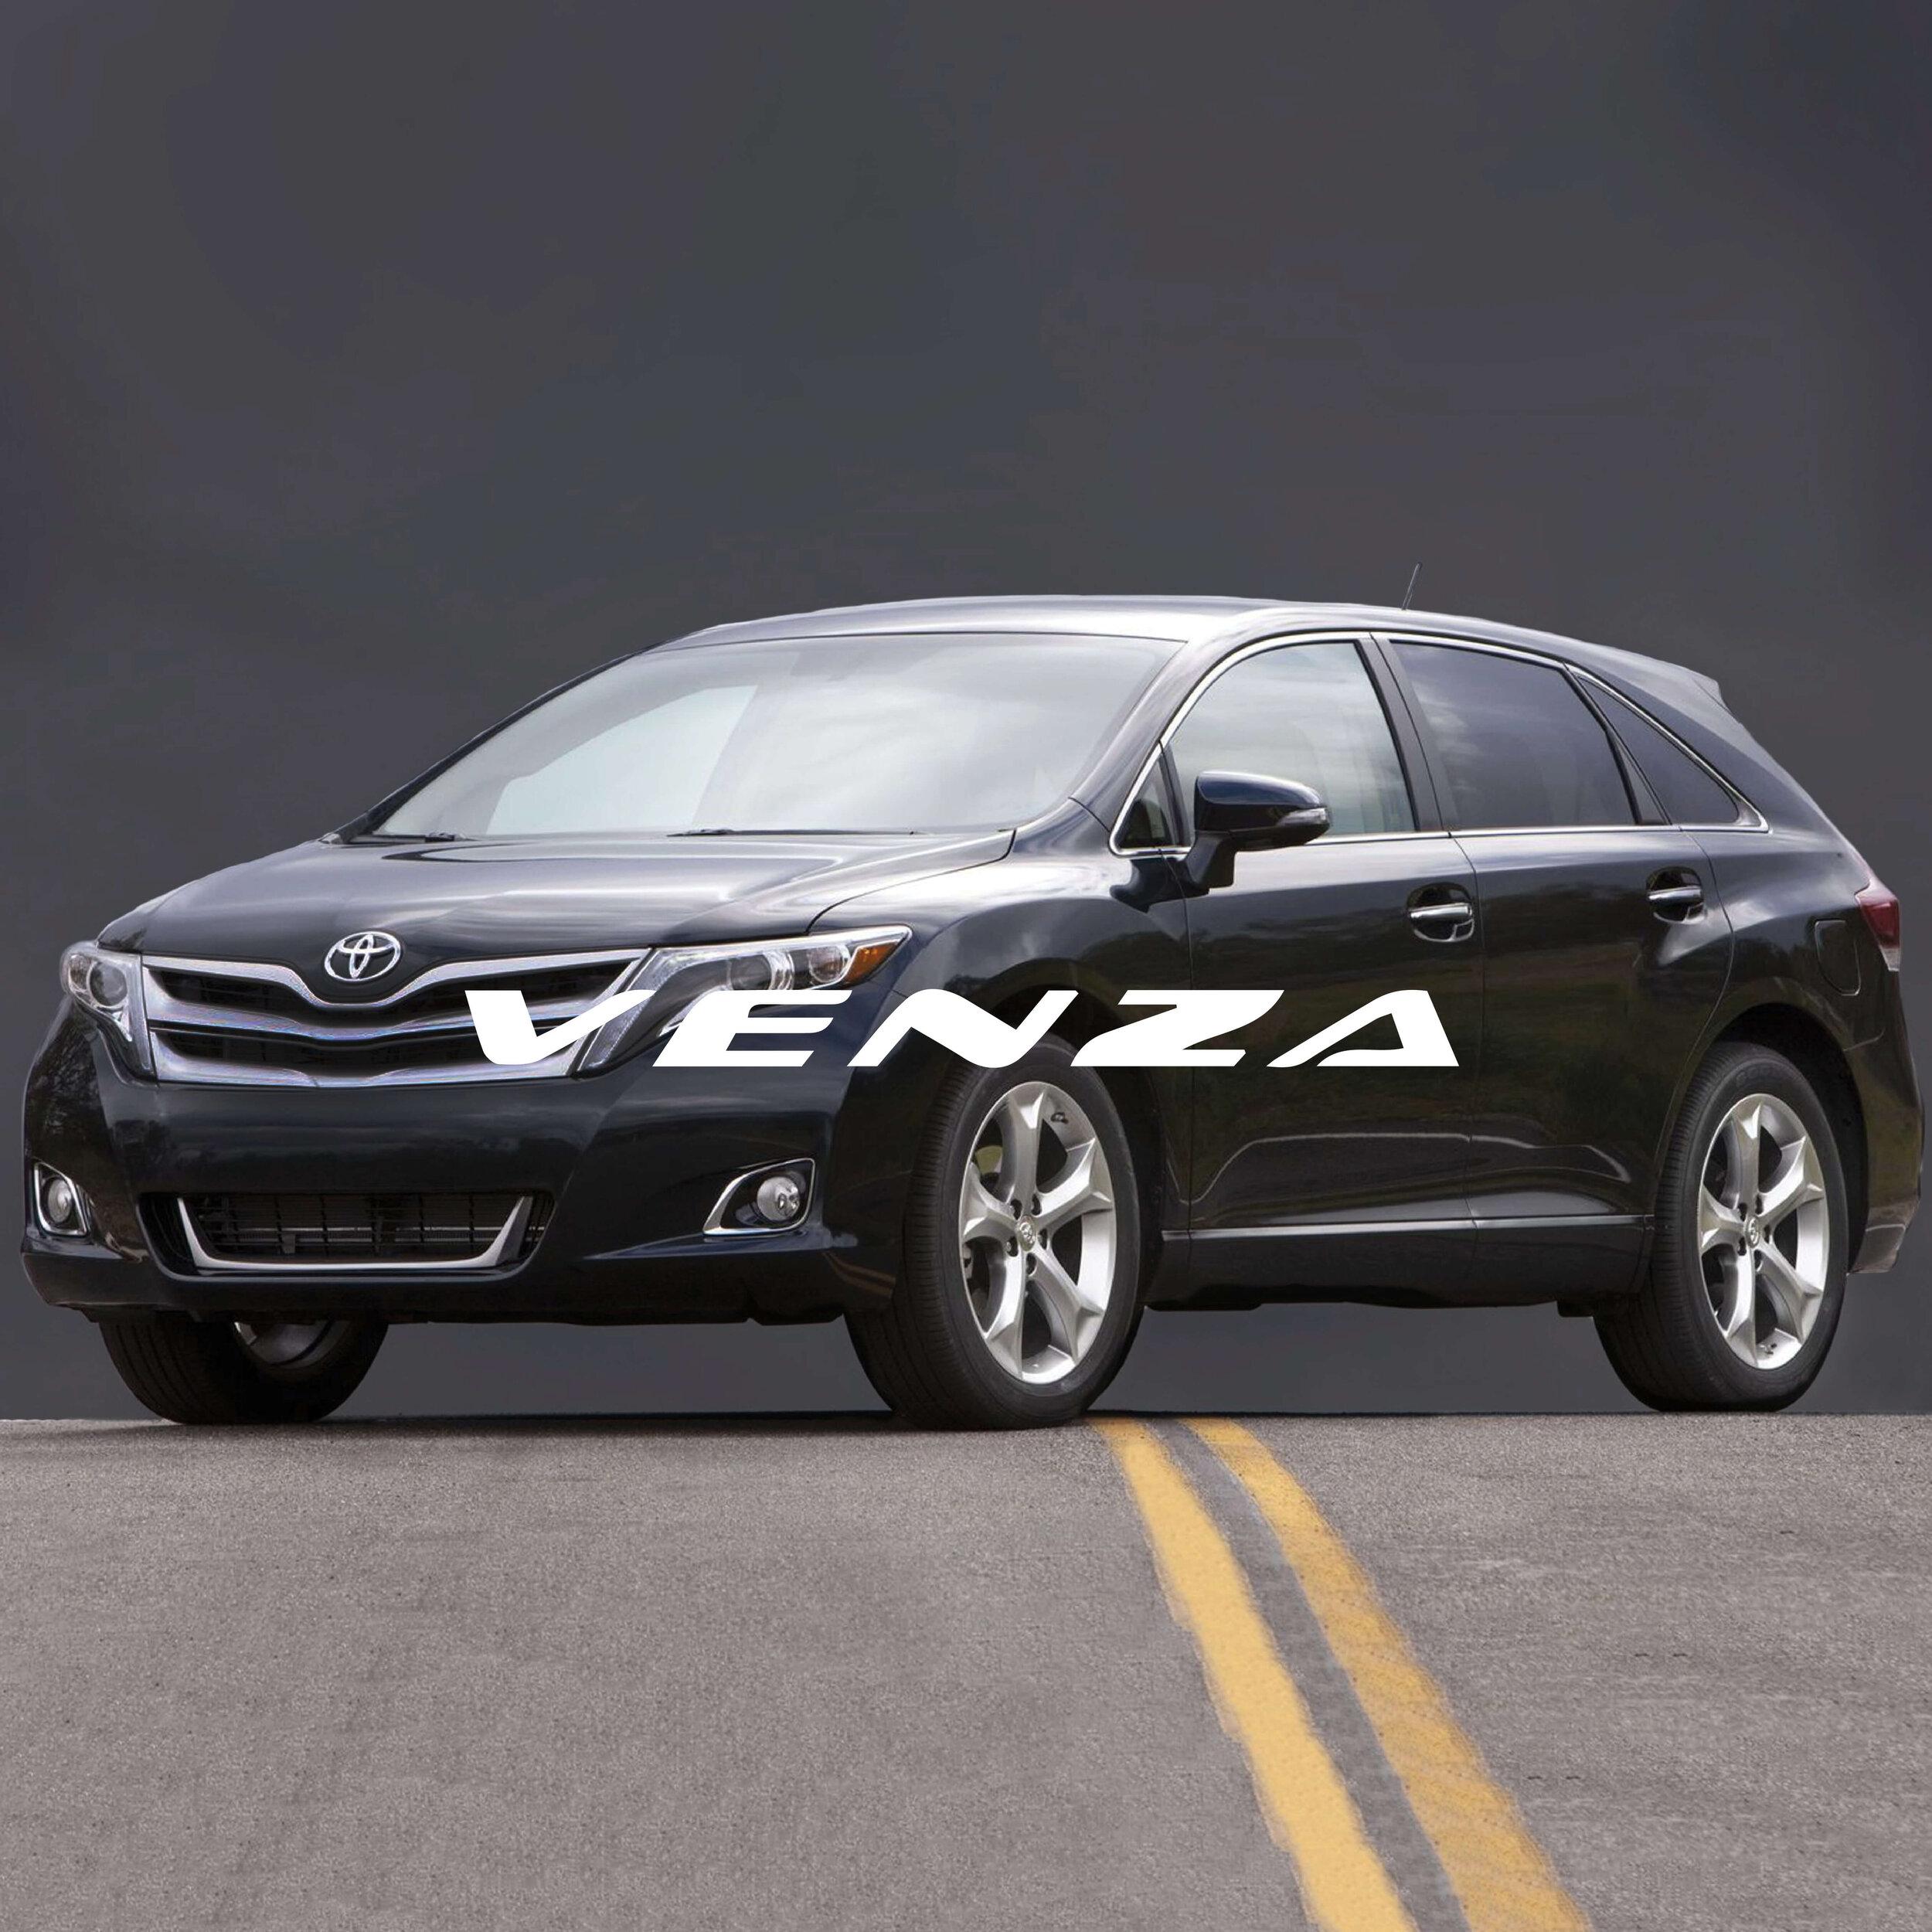 Venza_Toyota_credential.jpg